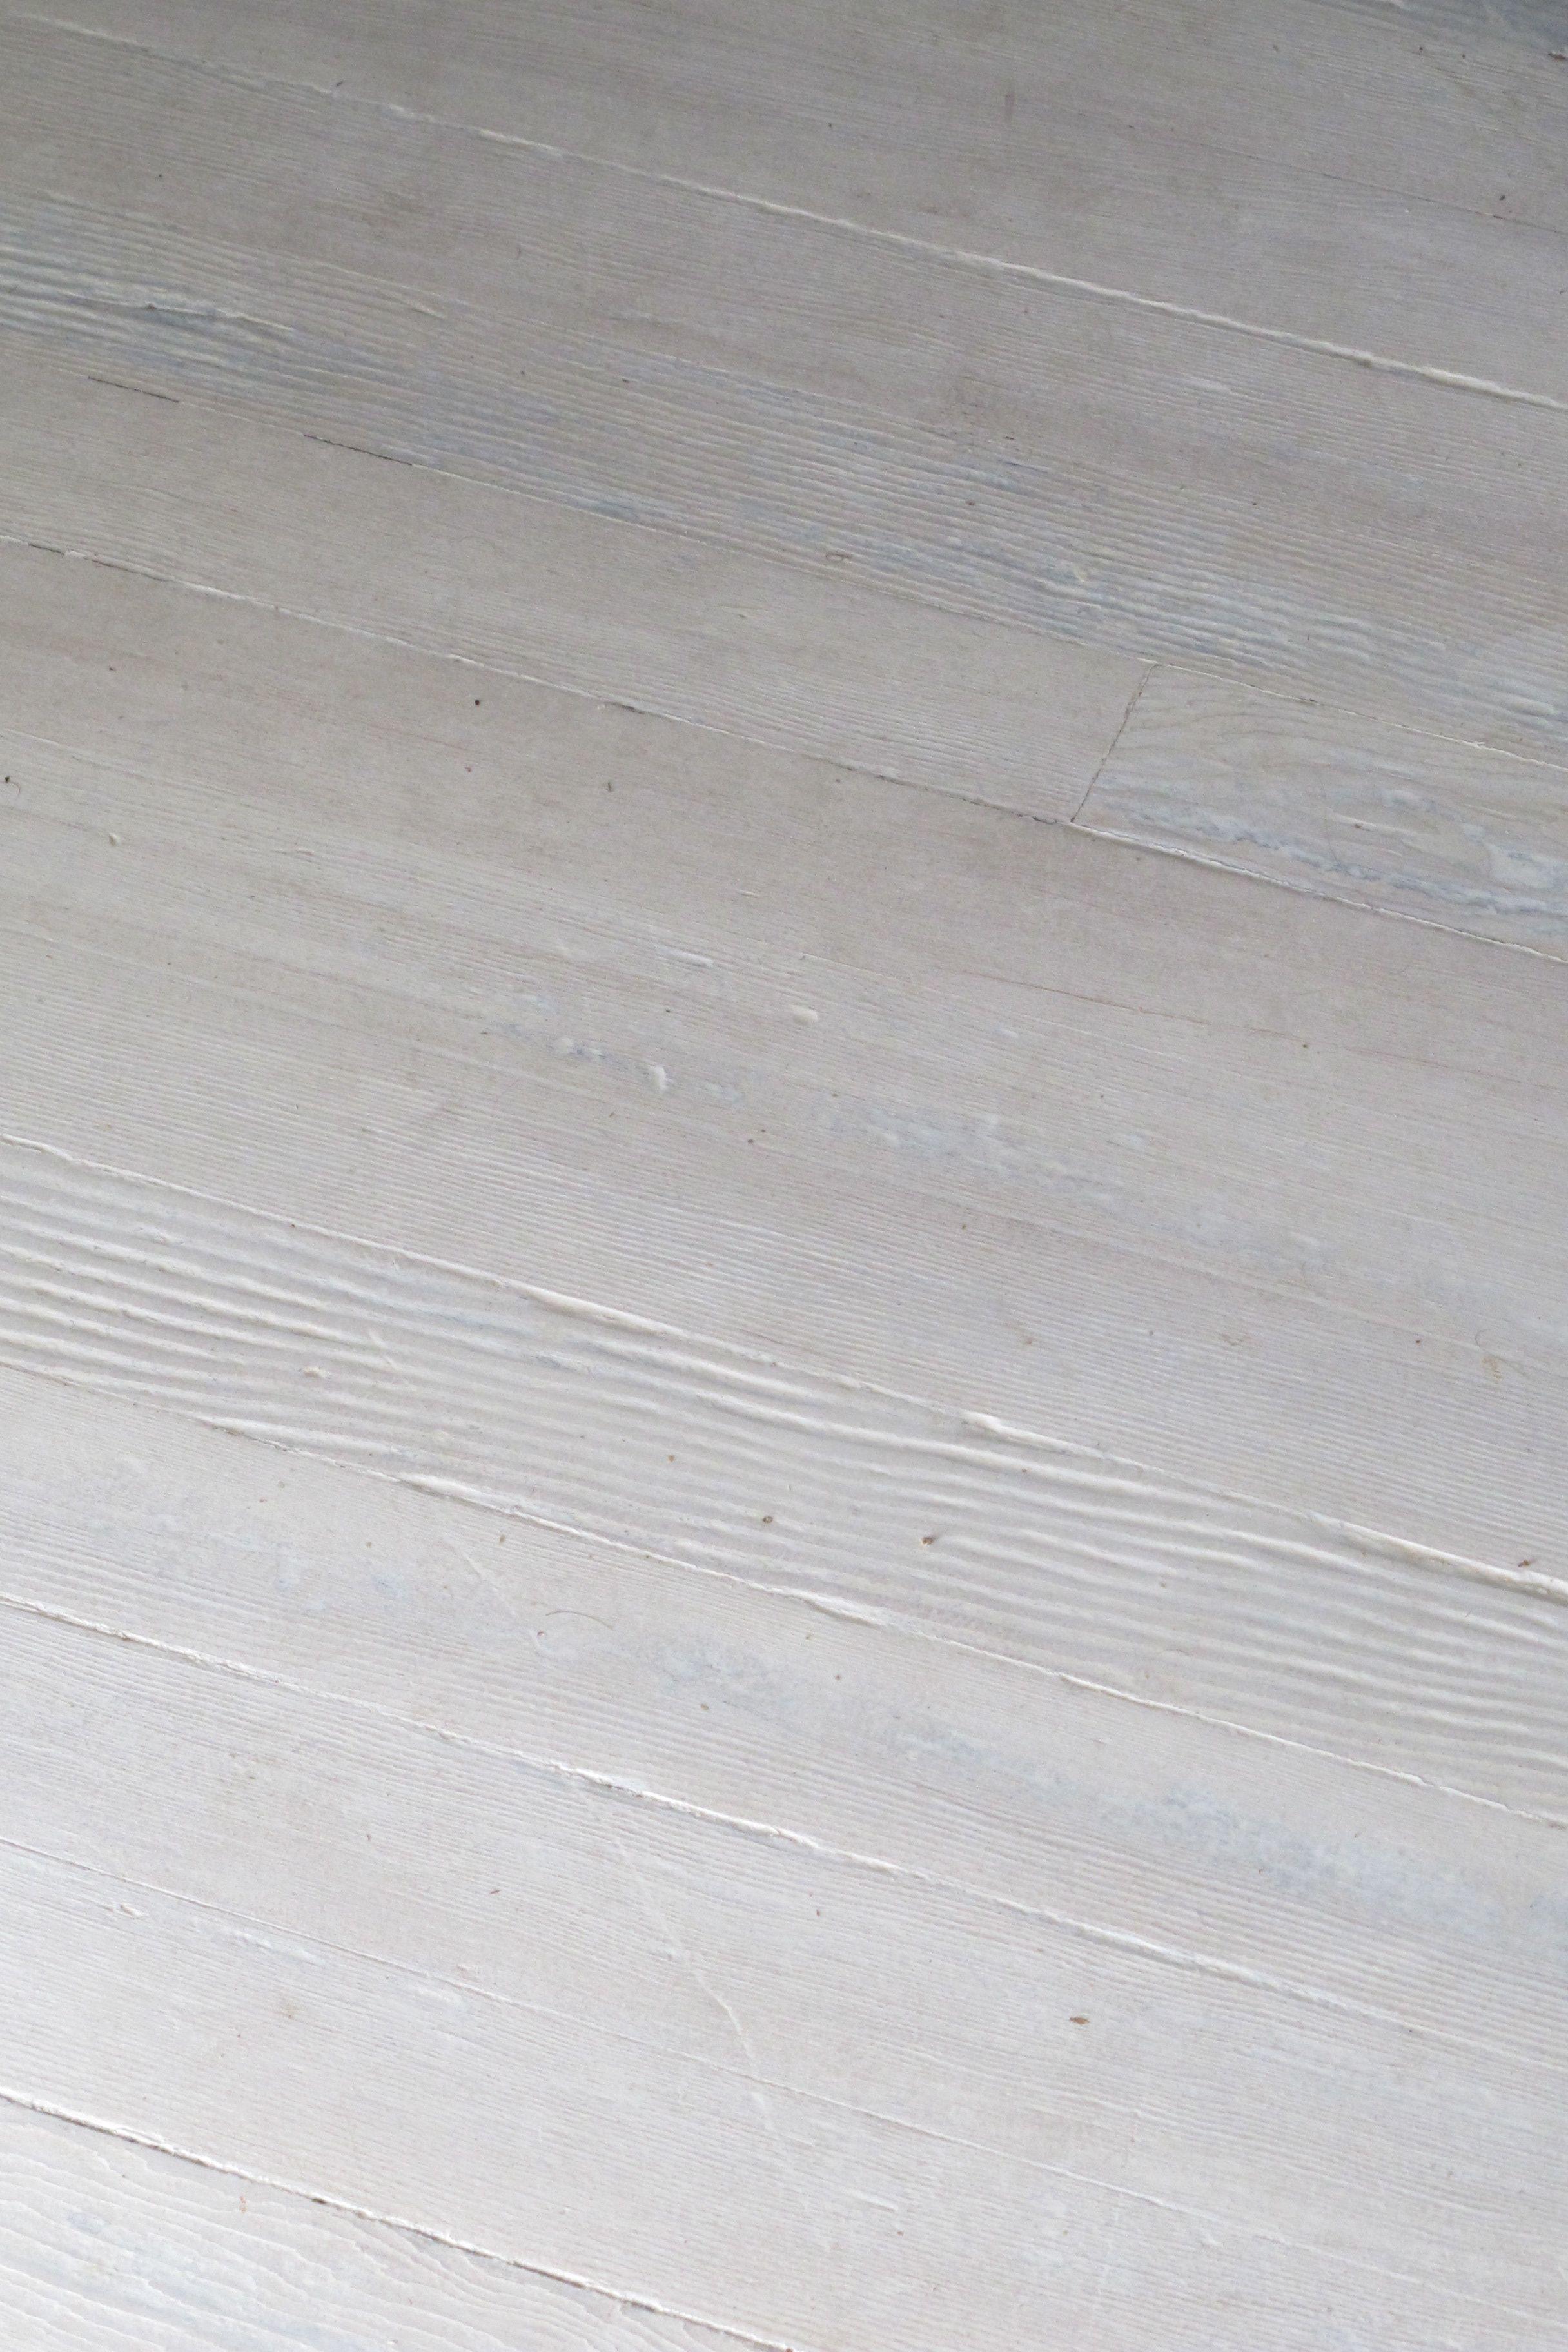 Diy White Washed Fir Floors White Washed Floors Flooring White Wash Wood Floors